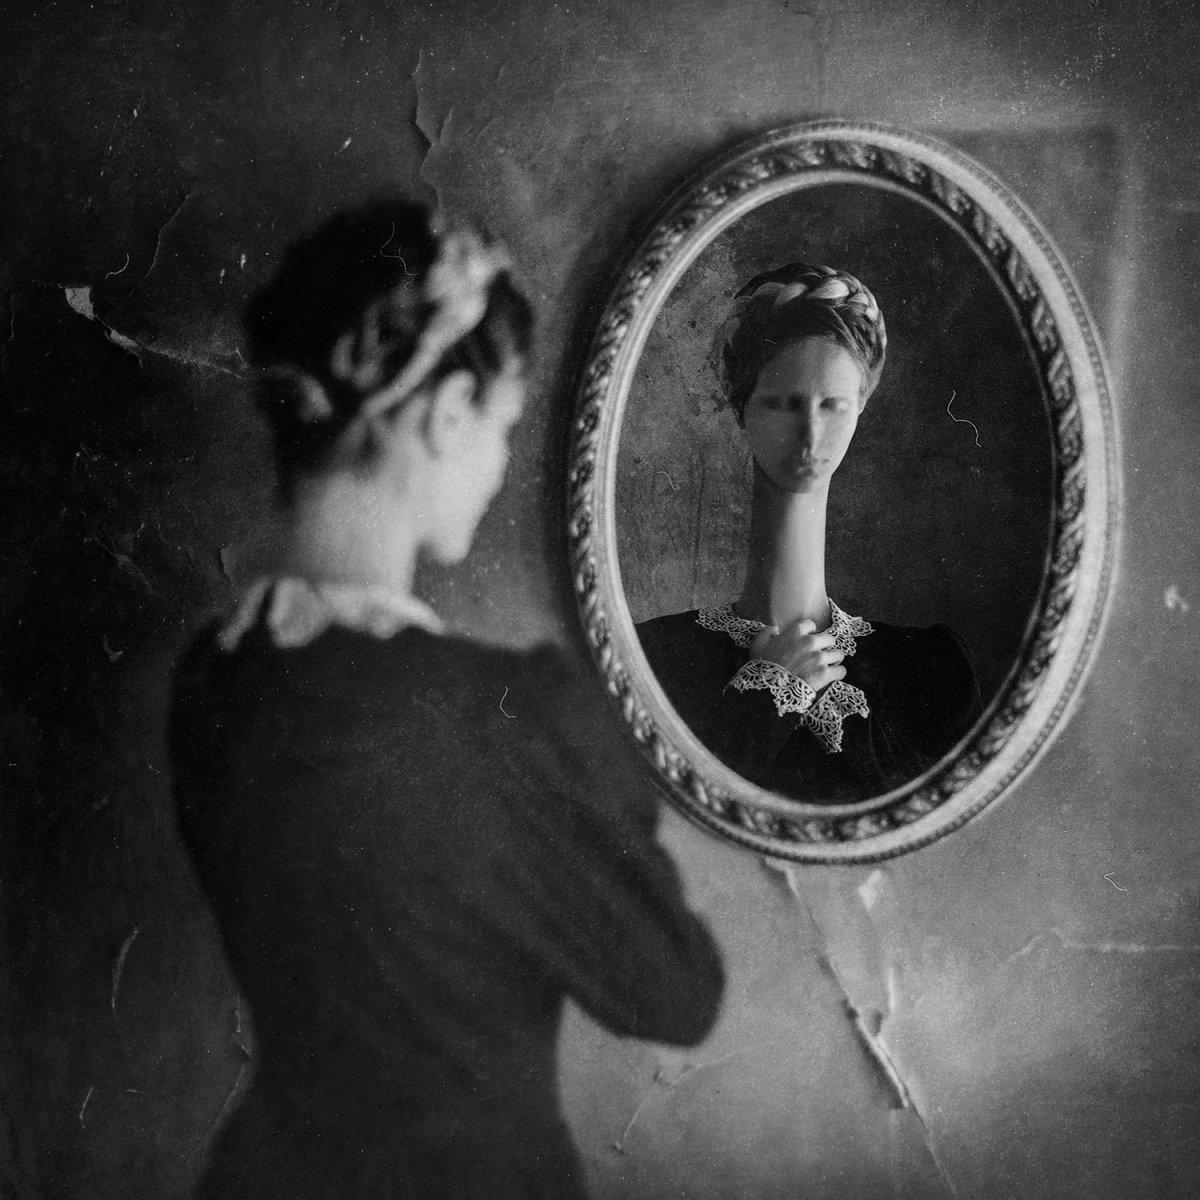 Otherworldly Imagery Of Frank Diamond surreal photography Mutant